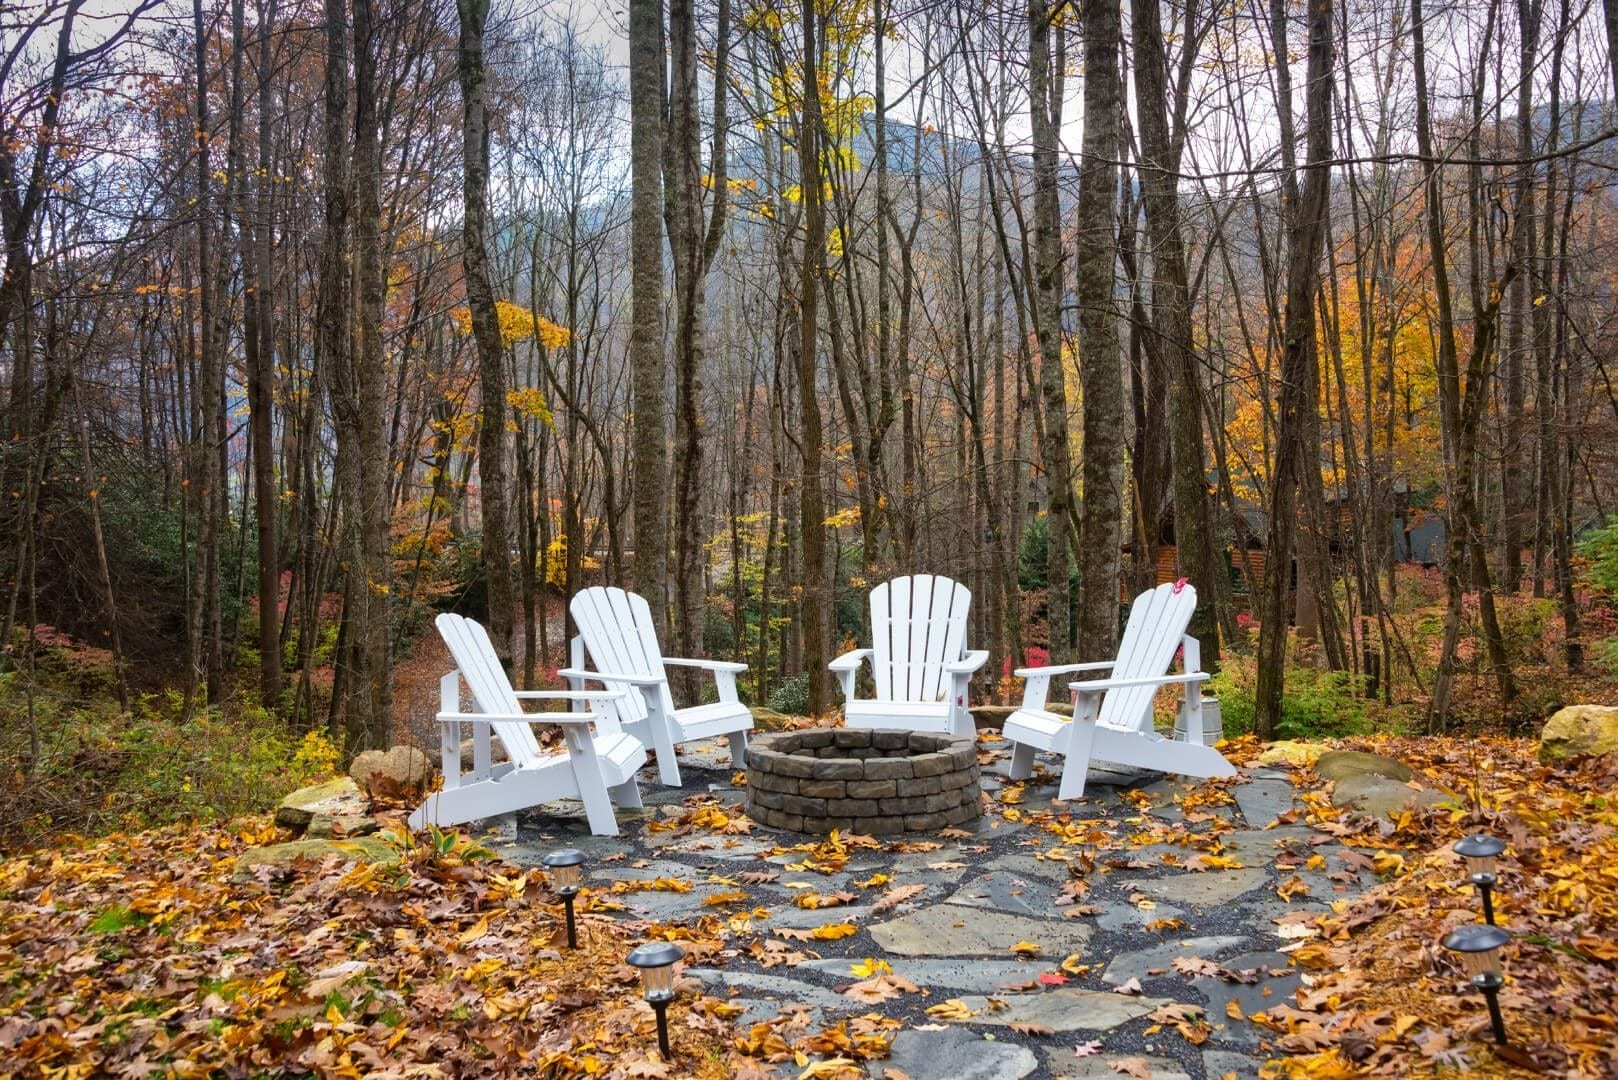 Expert Advice For Creating An Easy Enjoyable Fall Landscape